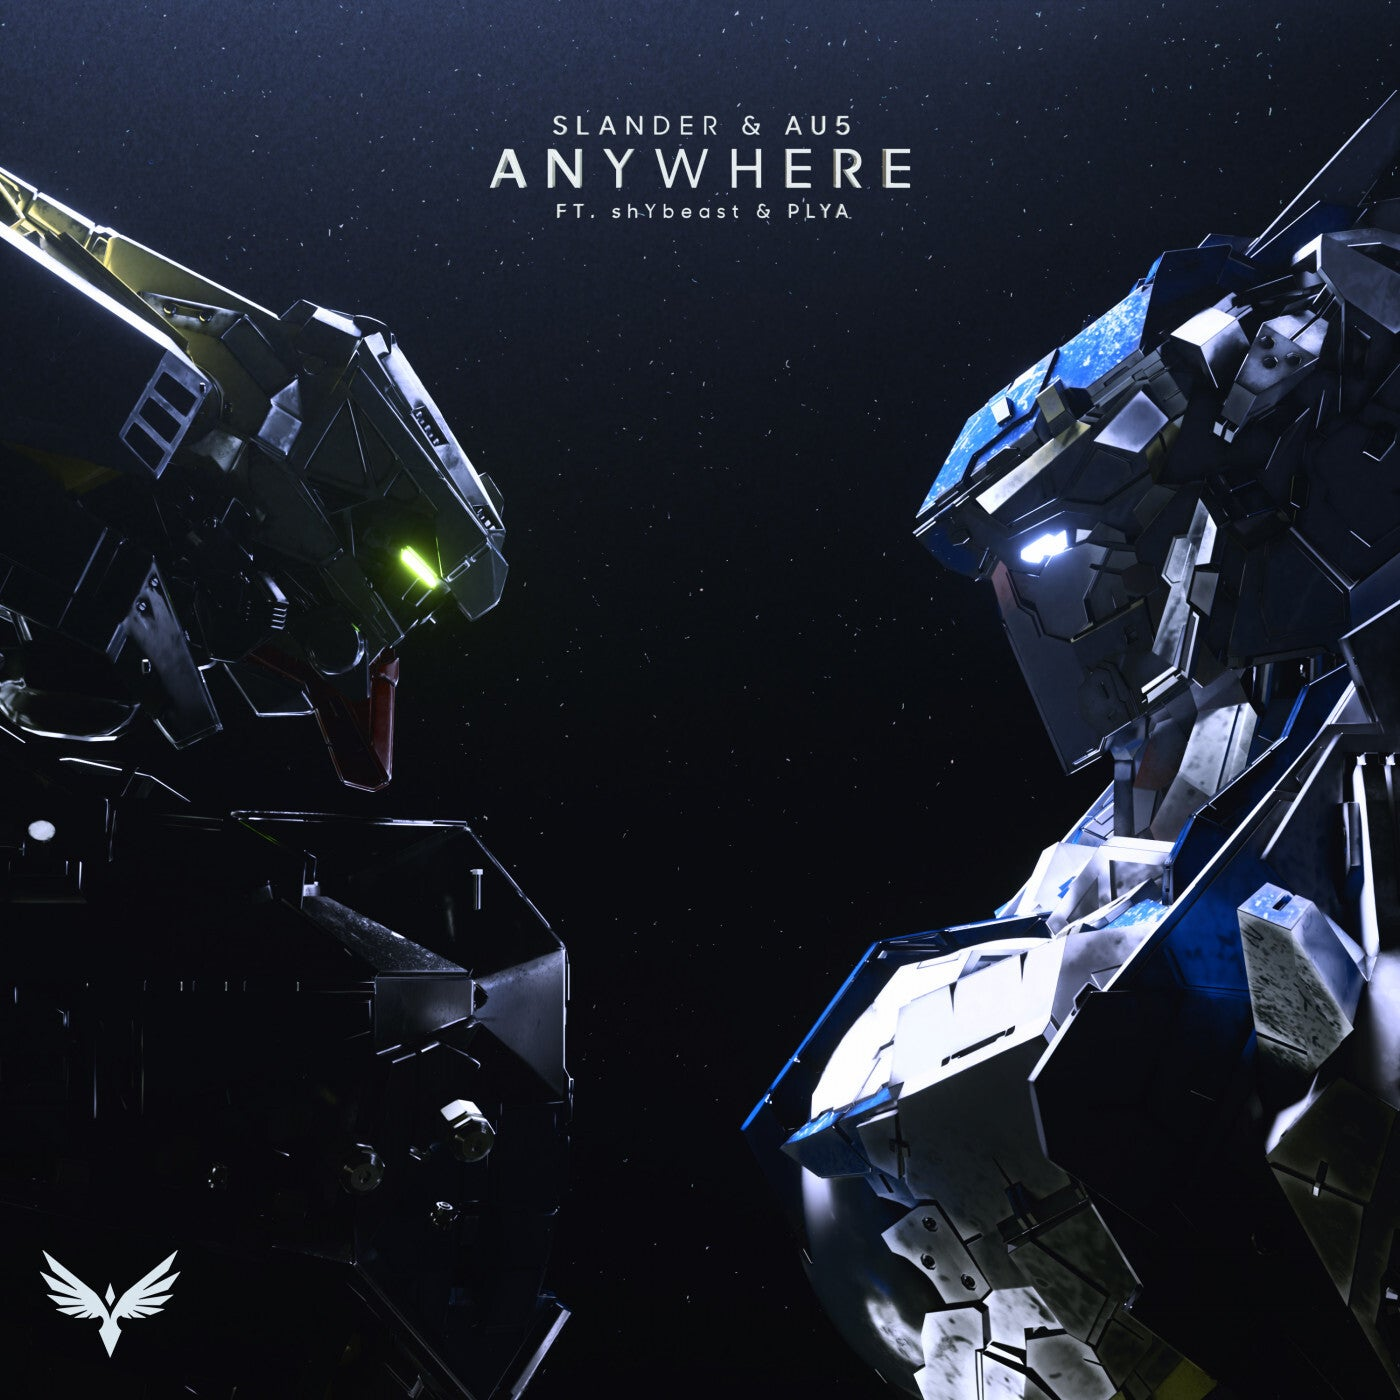 Anywhere (feat. shYbeast, PLYA) (Original Mix)